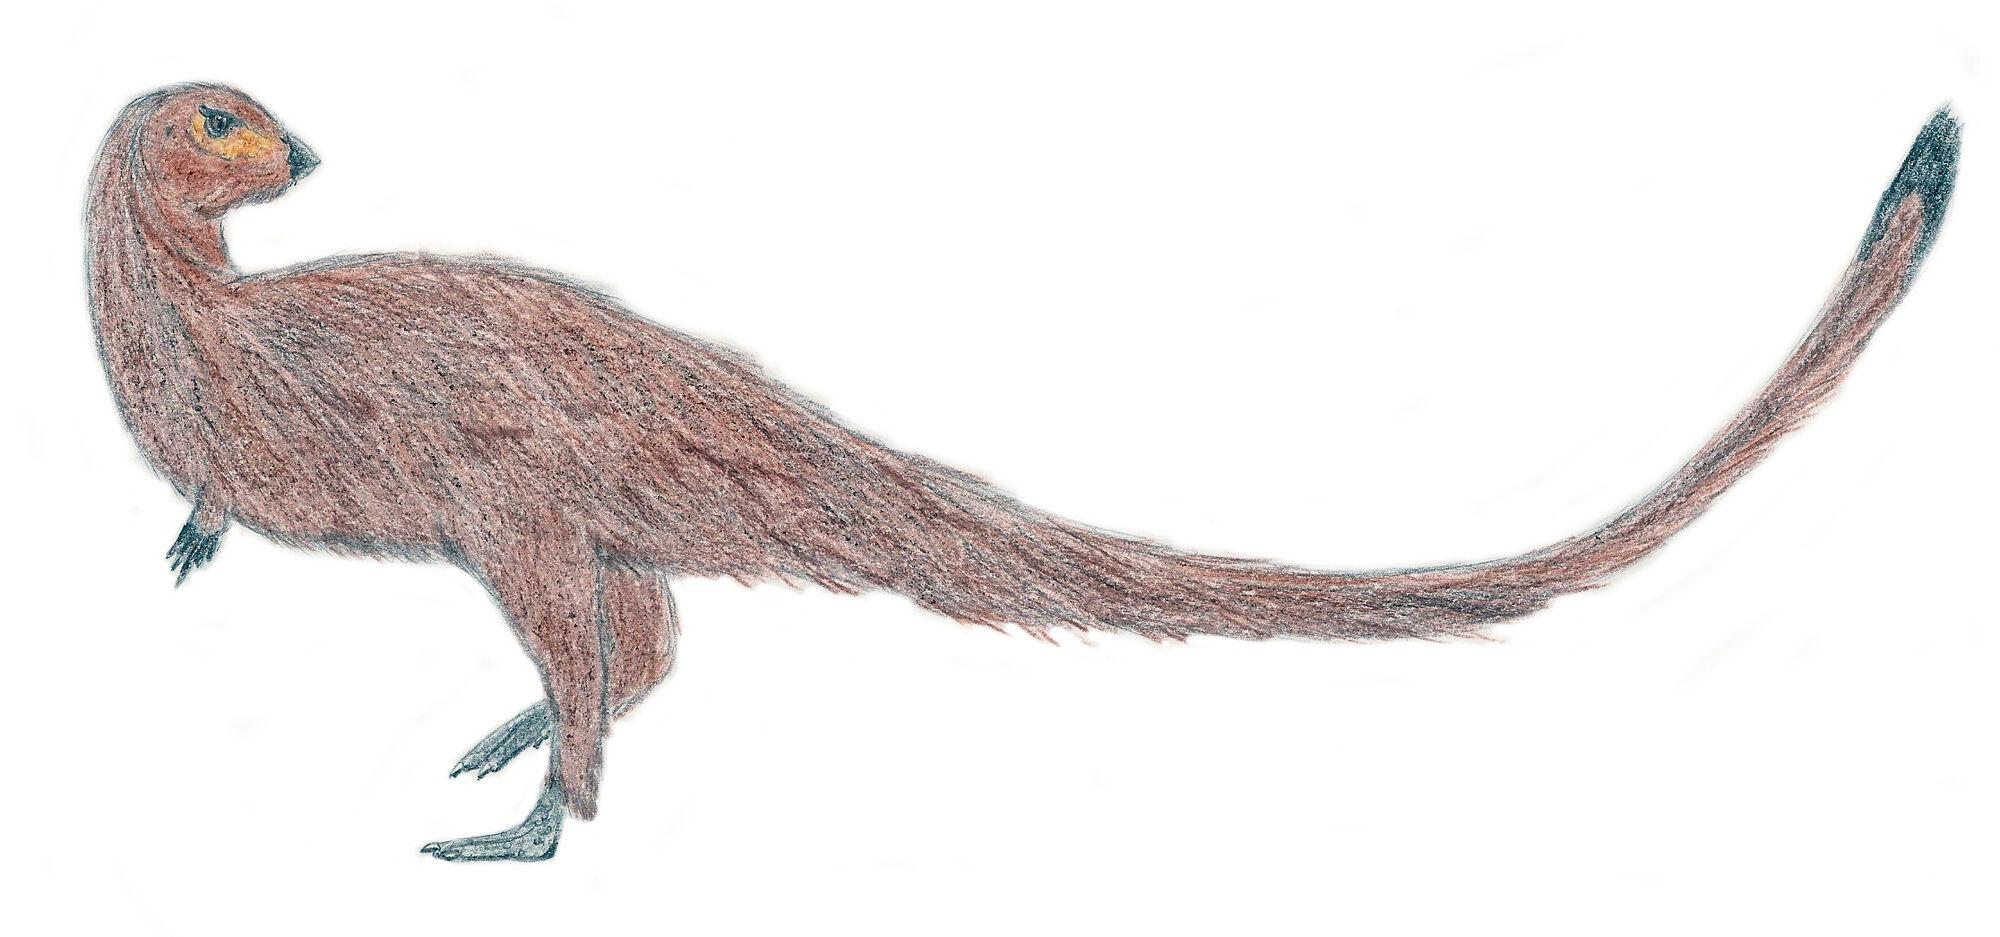 Leaellynasaura   Dinosaurier Wiki   FANDOM powered by Wikia